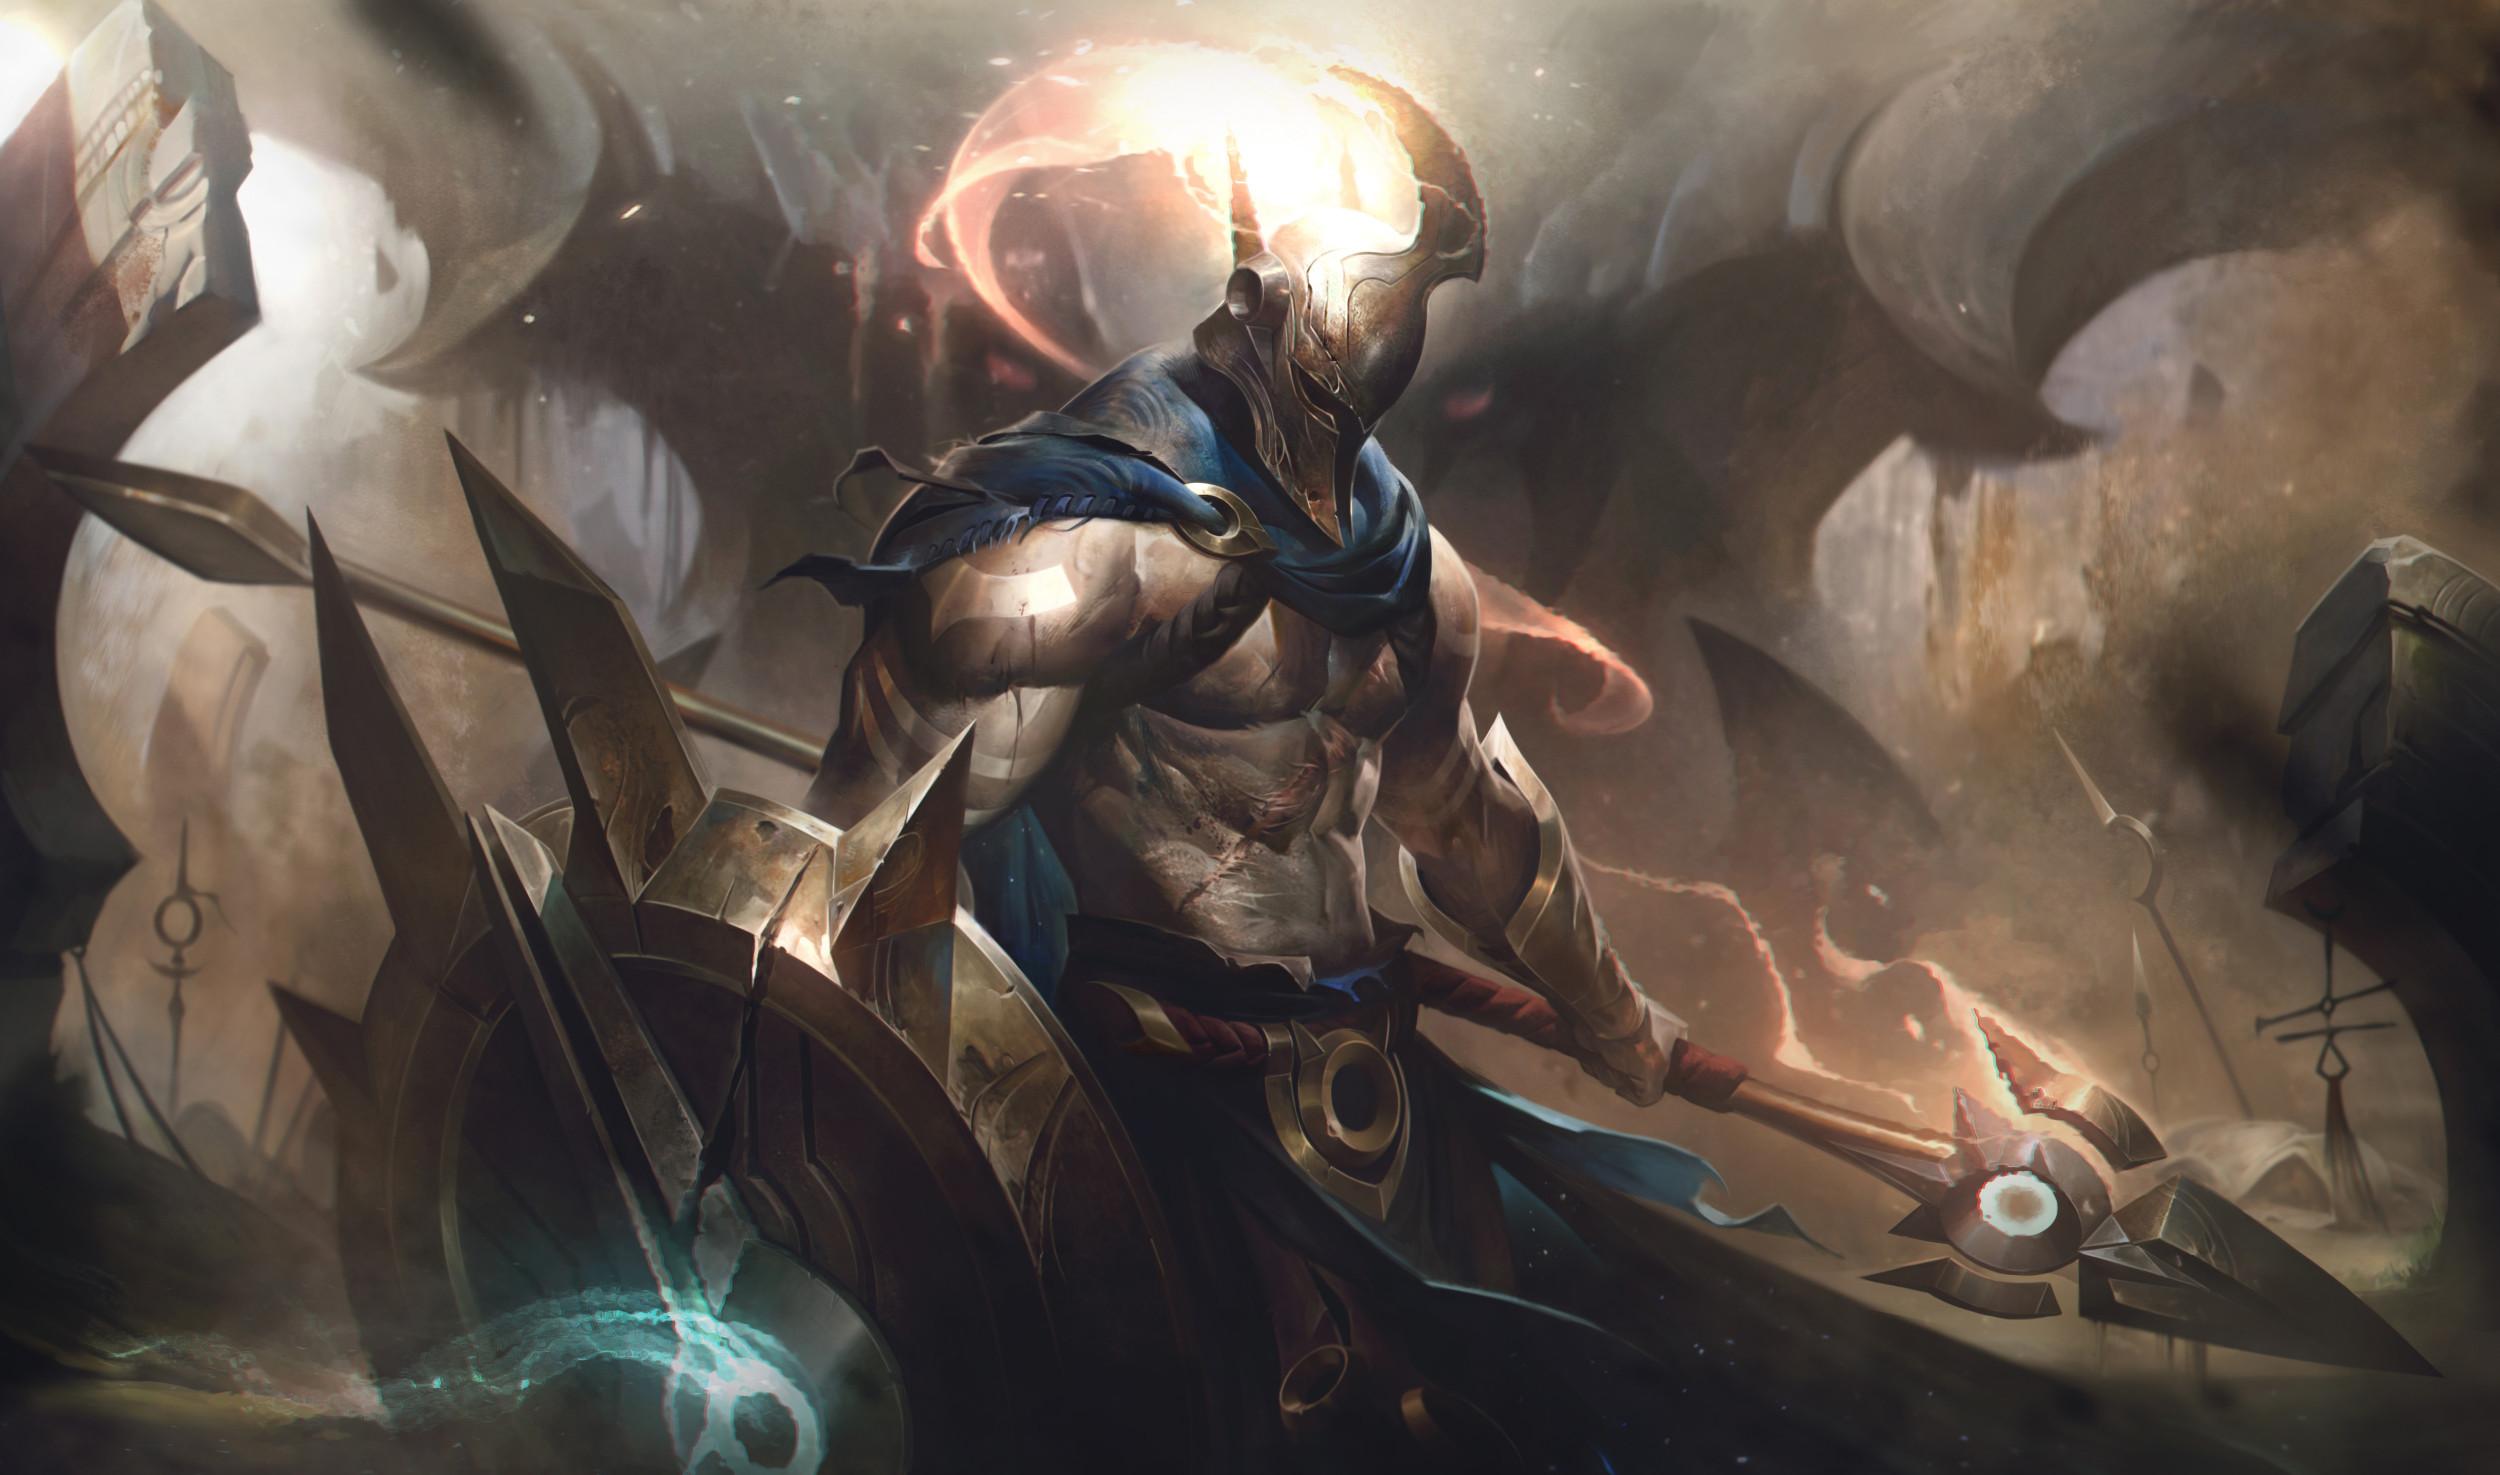 League of Legends' 9 16 Patch Notes: Pantheon Rework Strikes